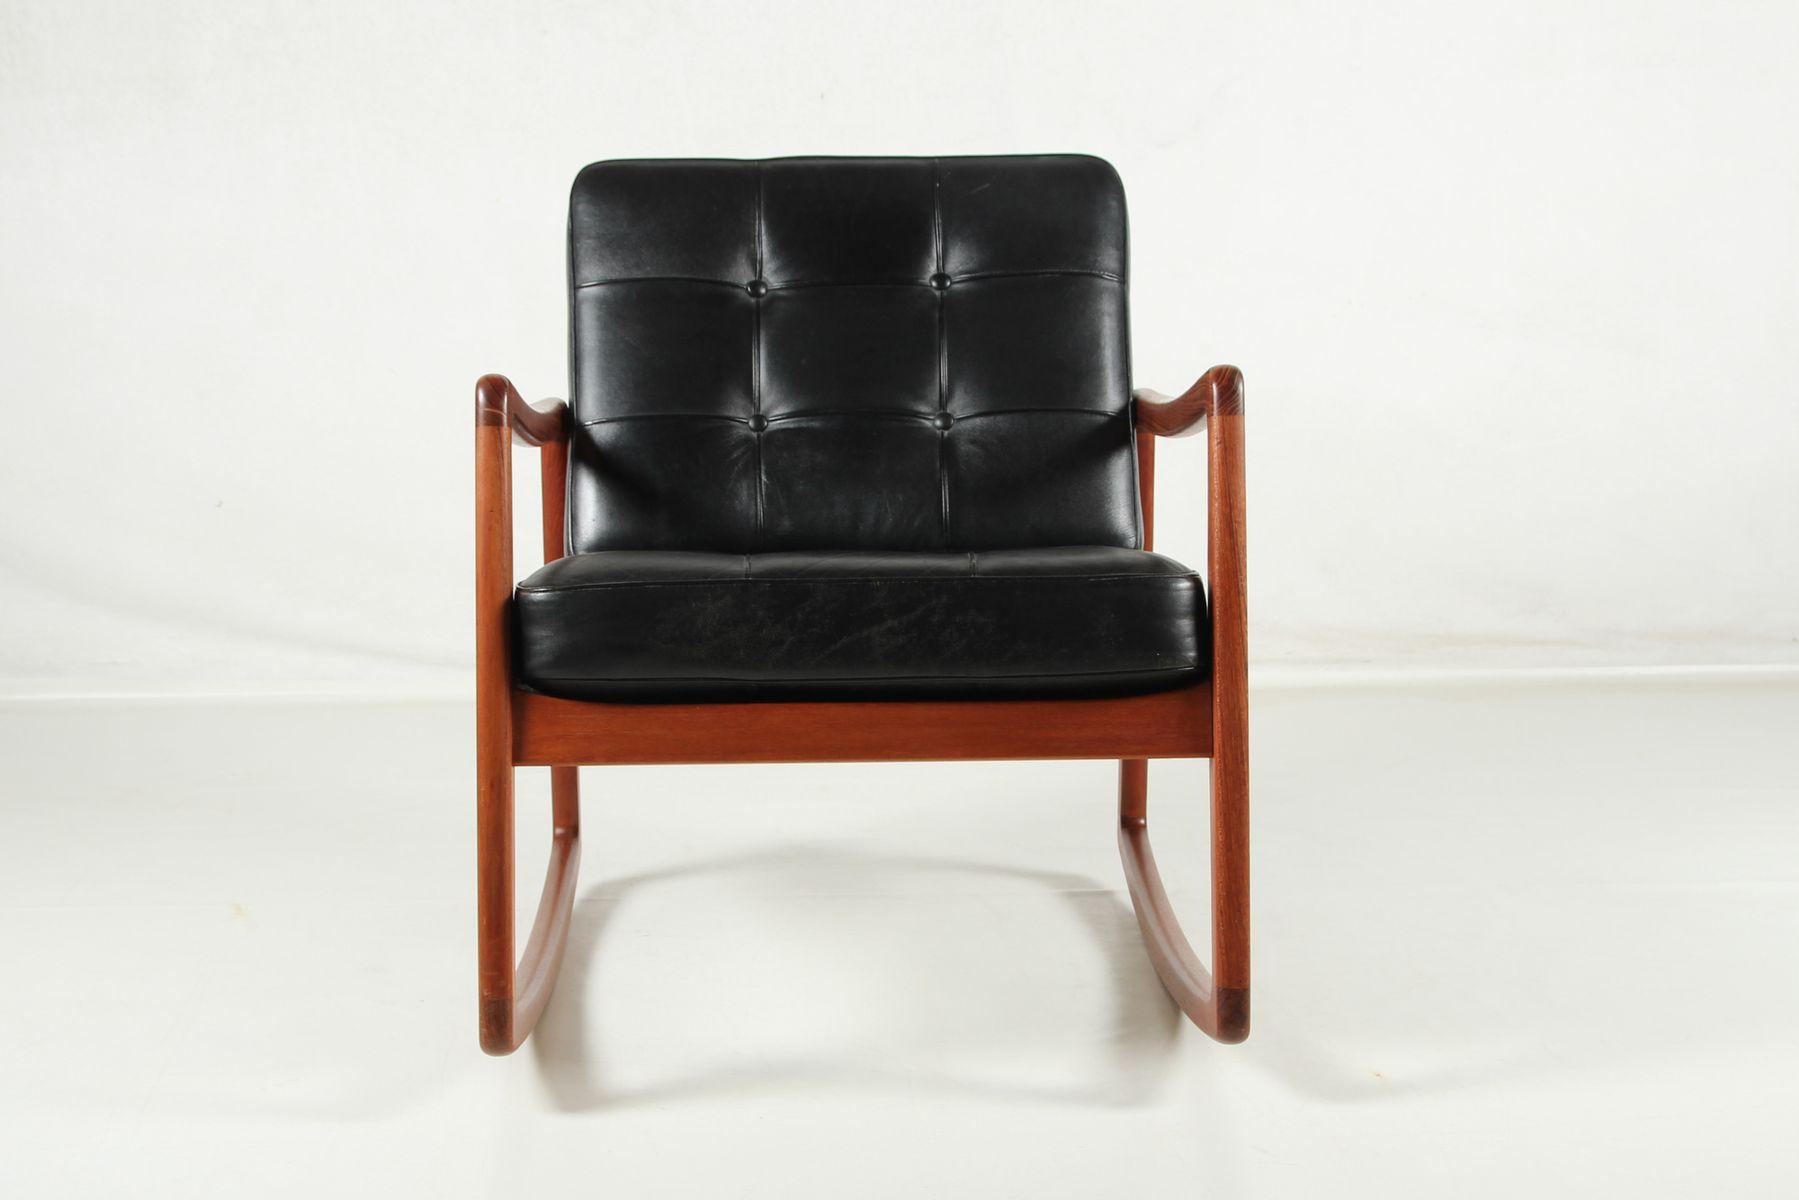 rocking chair mid century en teck cuir de vache par ole. Black Bedroom Furniture Sets. Home Design Ideas